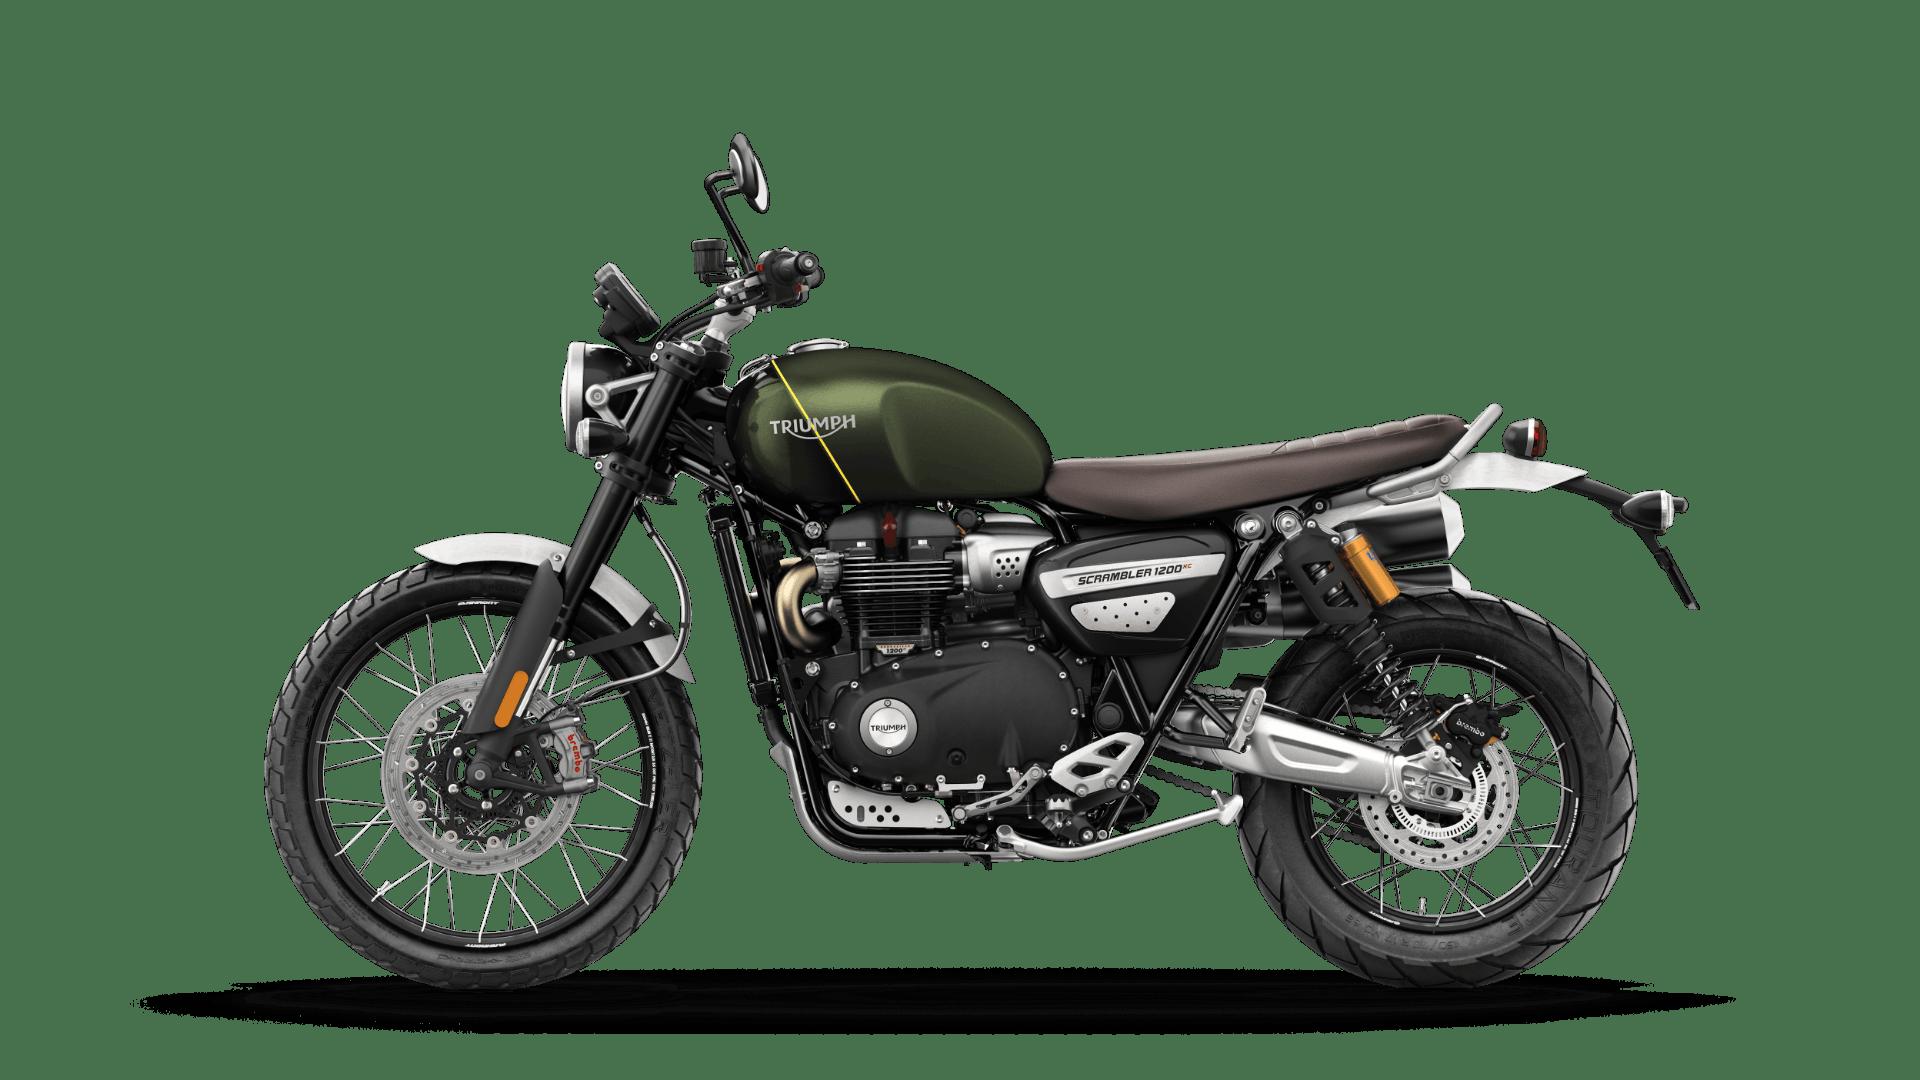 New 2019 TRIUMPH SCRAMBLER 1200 XC Motorcycle in Denver #19T26 | Erico Motorsports